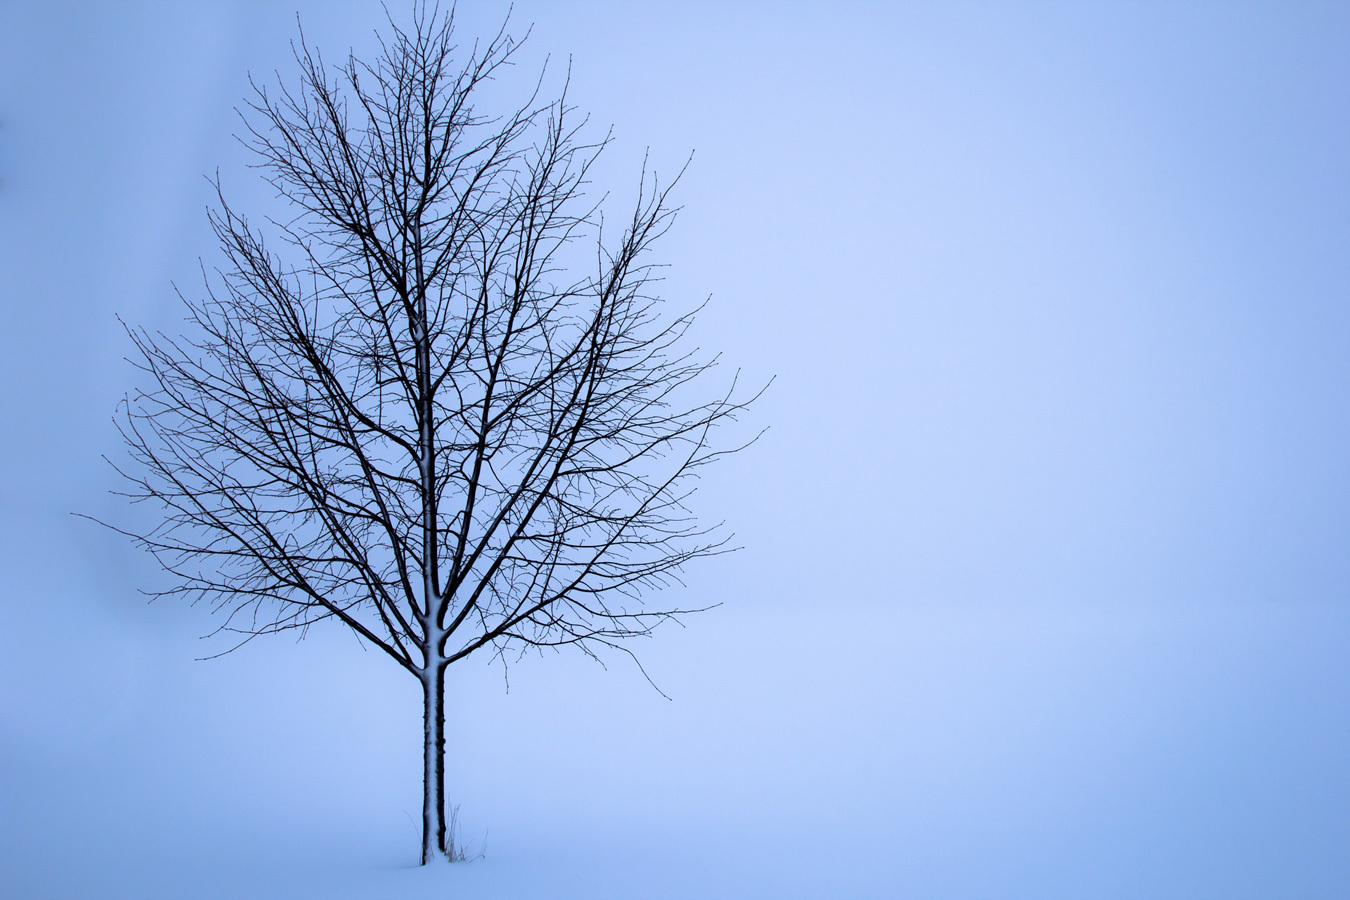 tree-1056598_1920.jpg